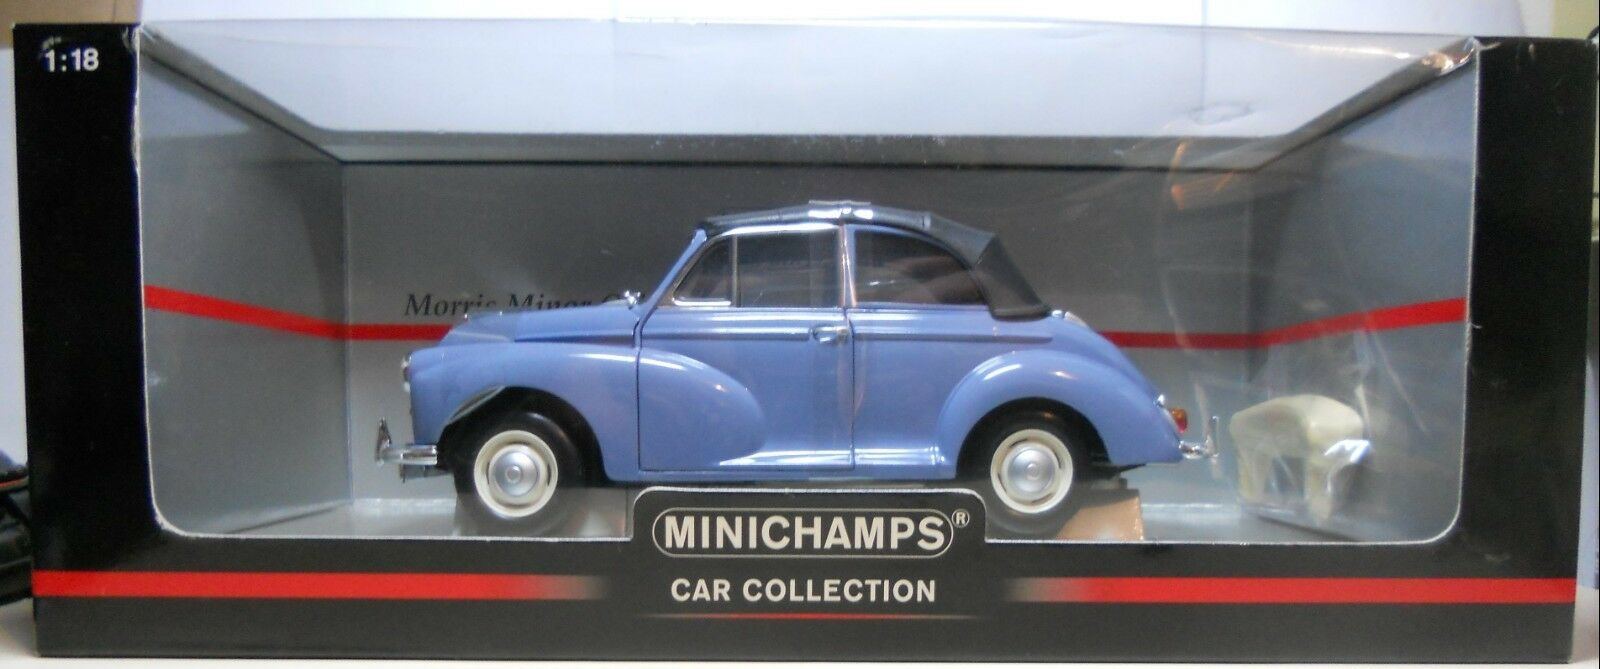 Minichamps autosammlung 1   18 skala druckguss morris minor cabriolet blau (neu)